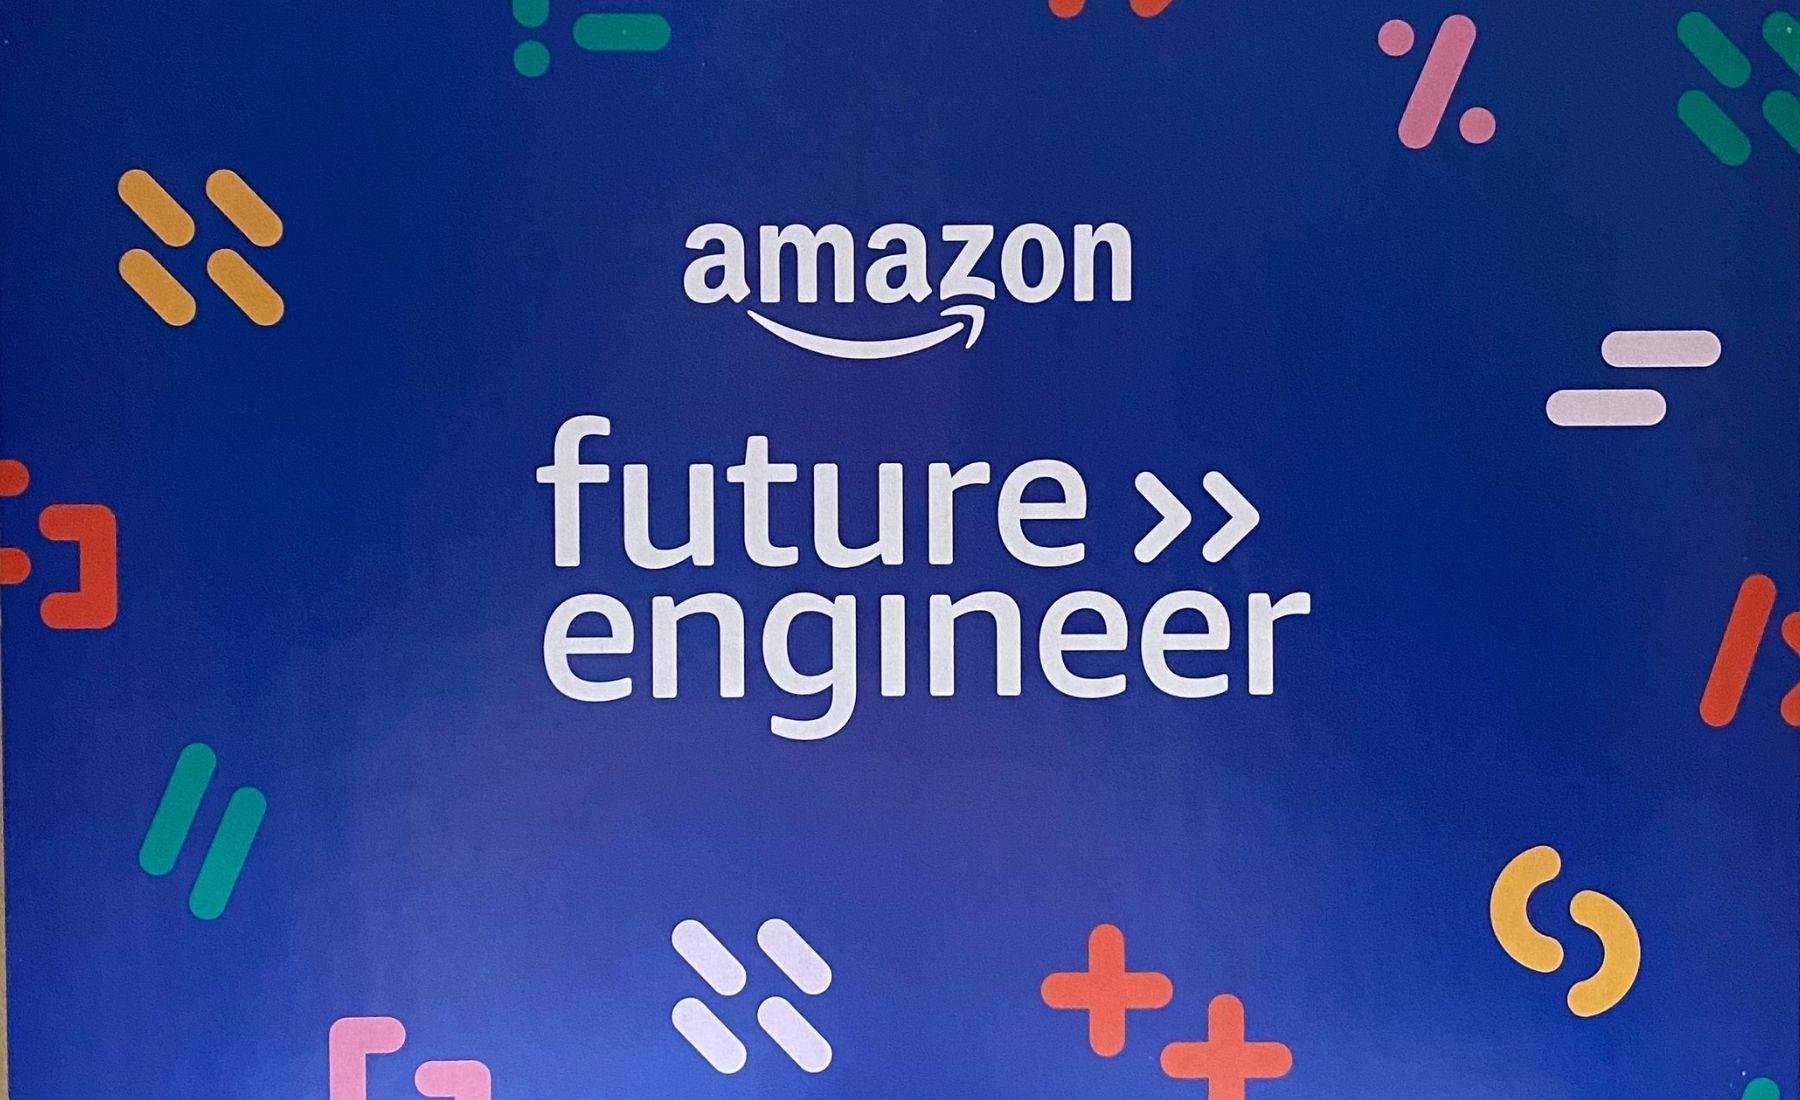 Amazon Community Send out